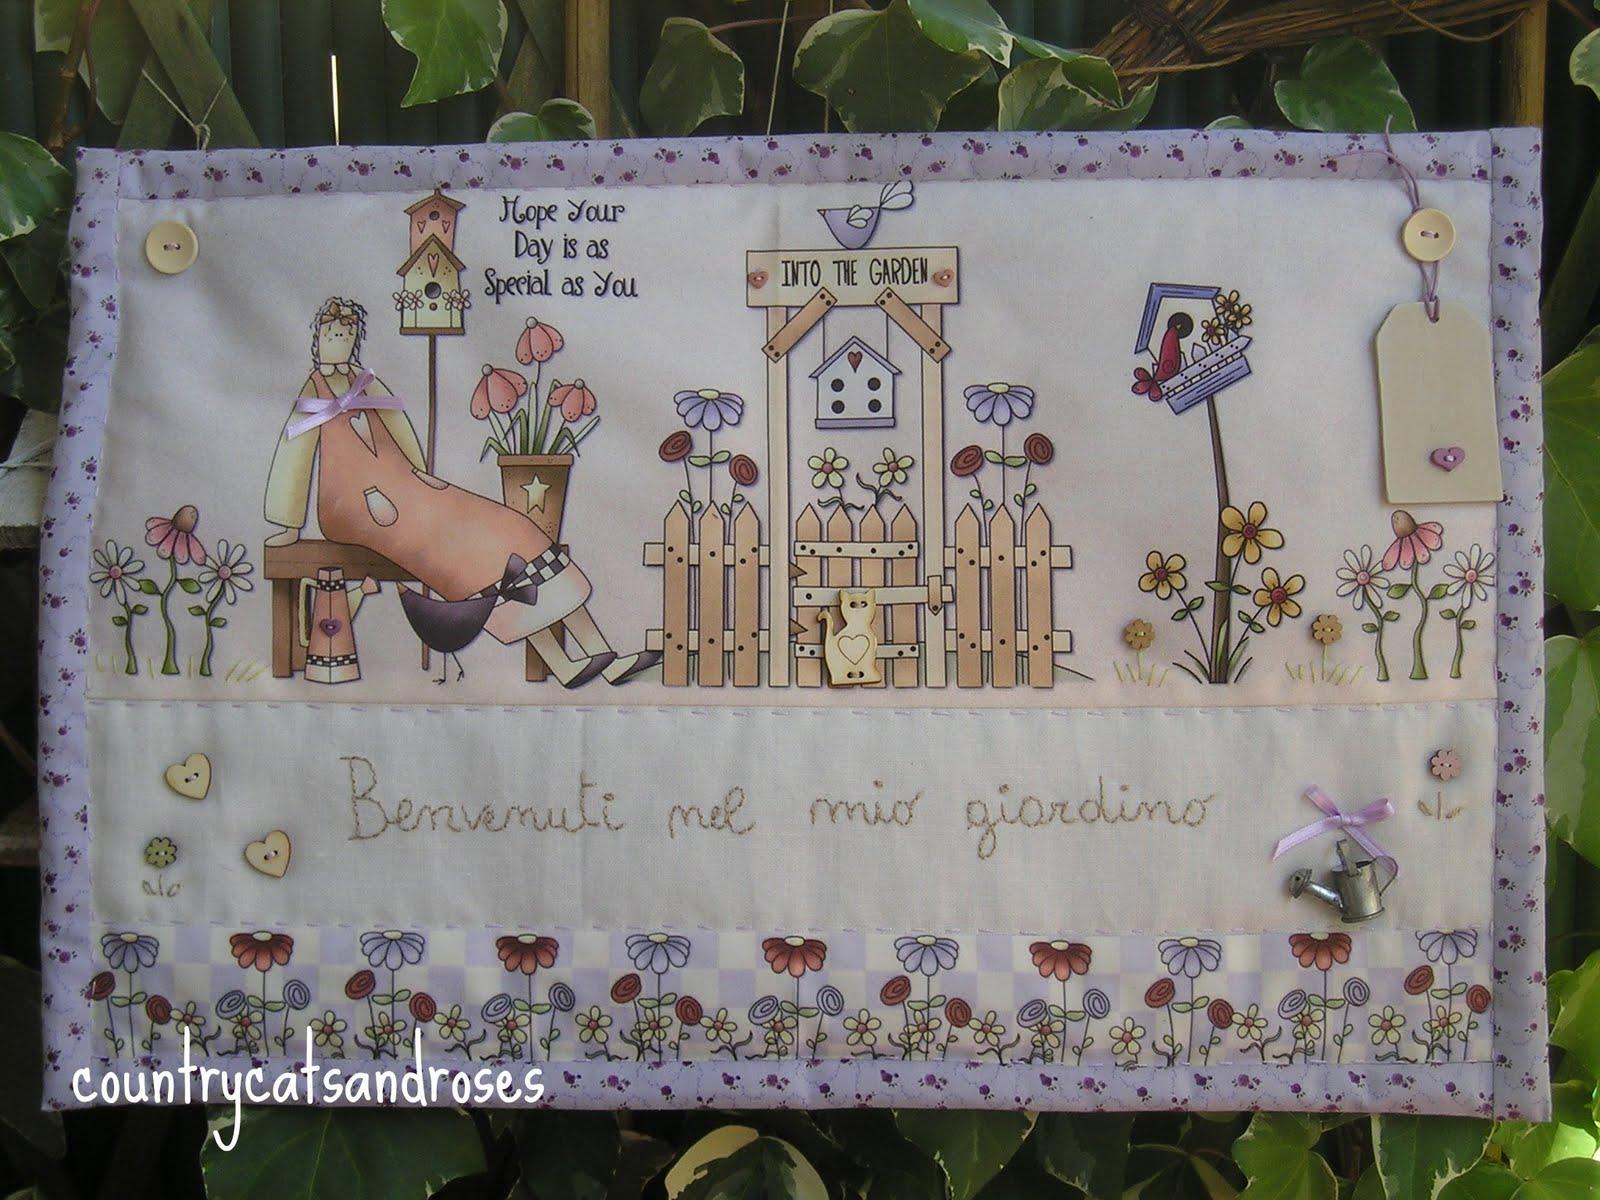 Countrycatsandroses: angeli country per chi ama il giardino.......